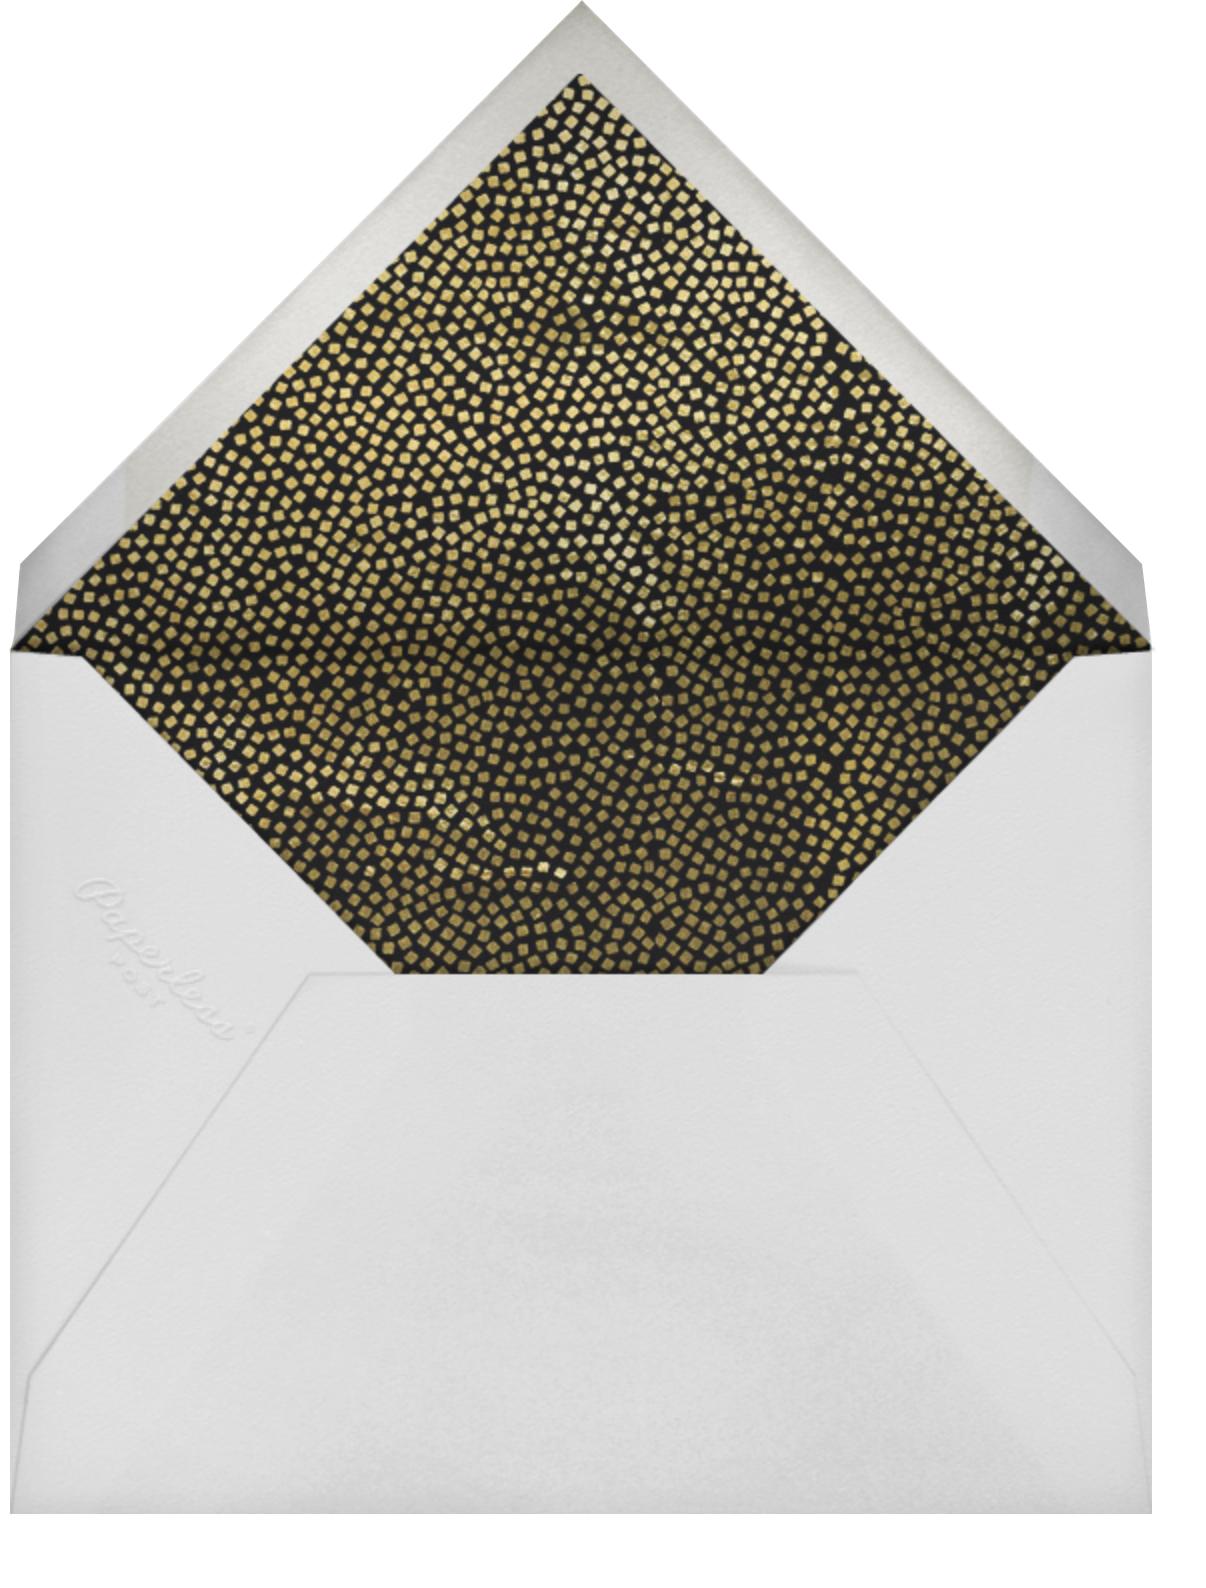 Konfetti (Photo) - Gold - Kelly Wearstler - Graduation party - envelope back